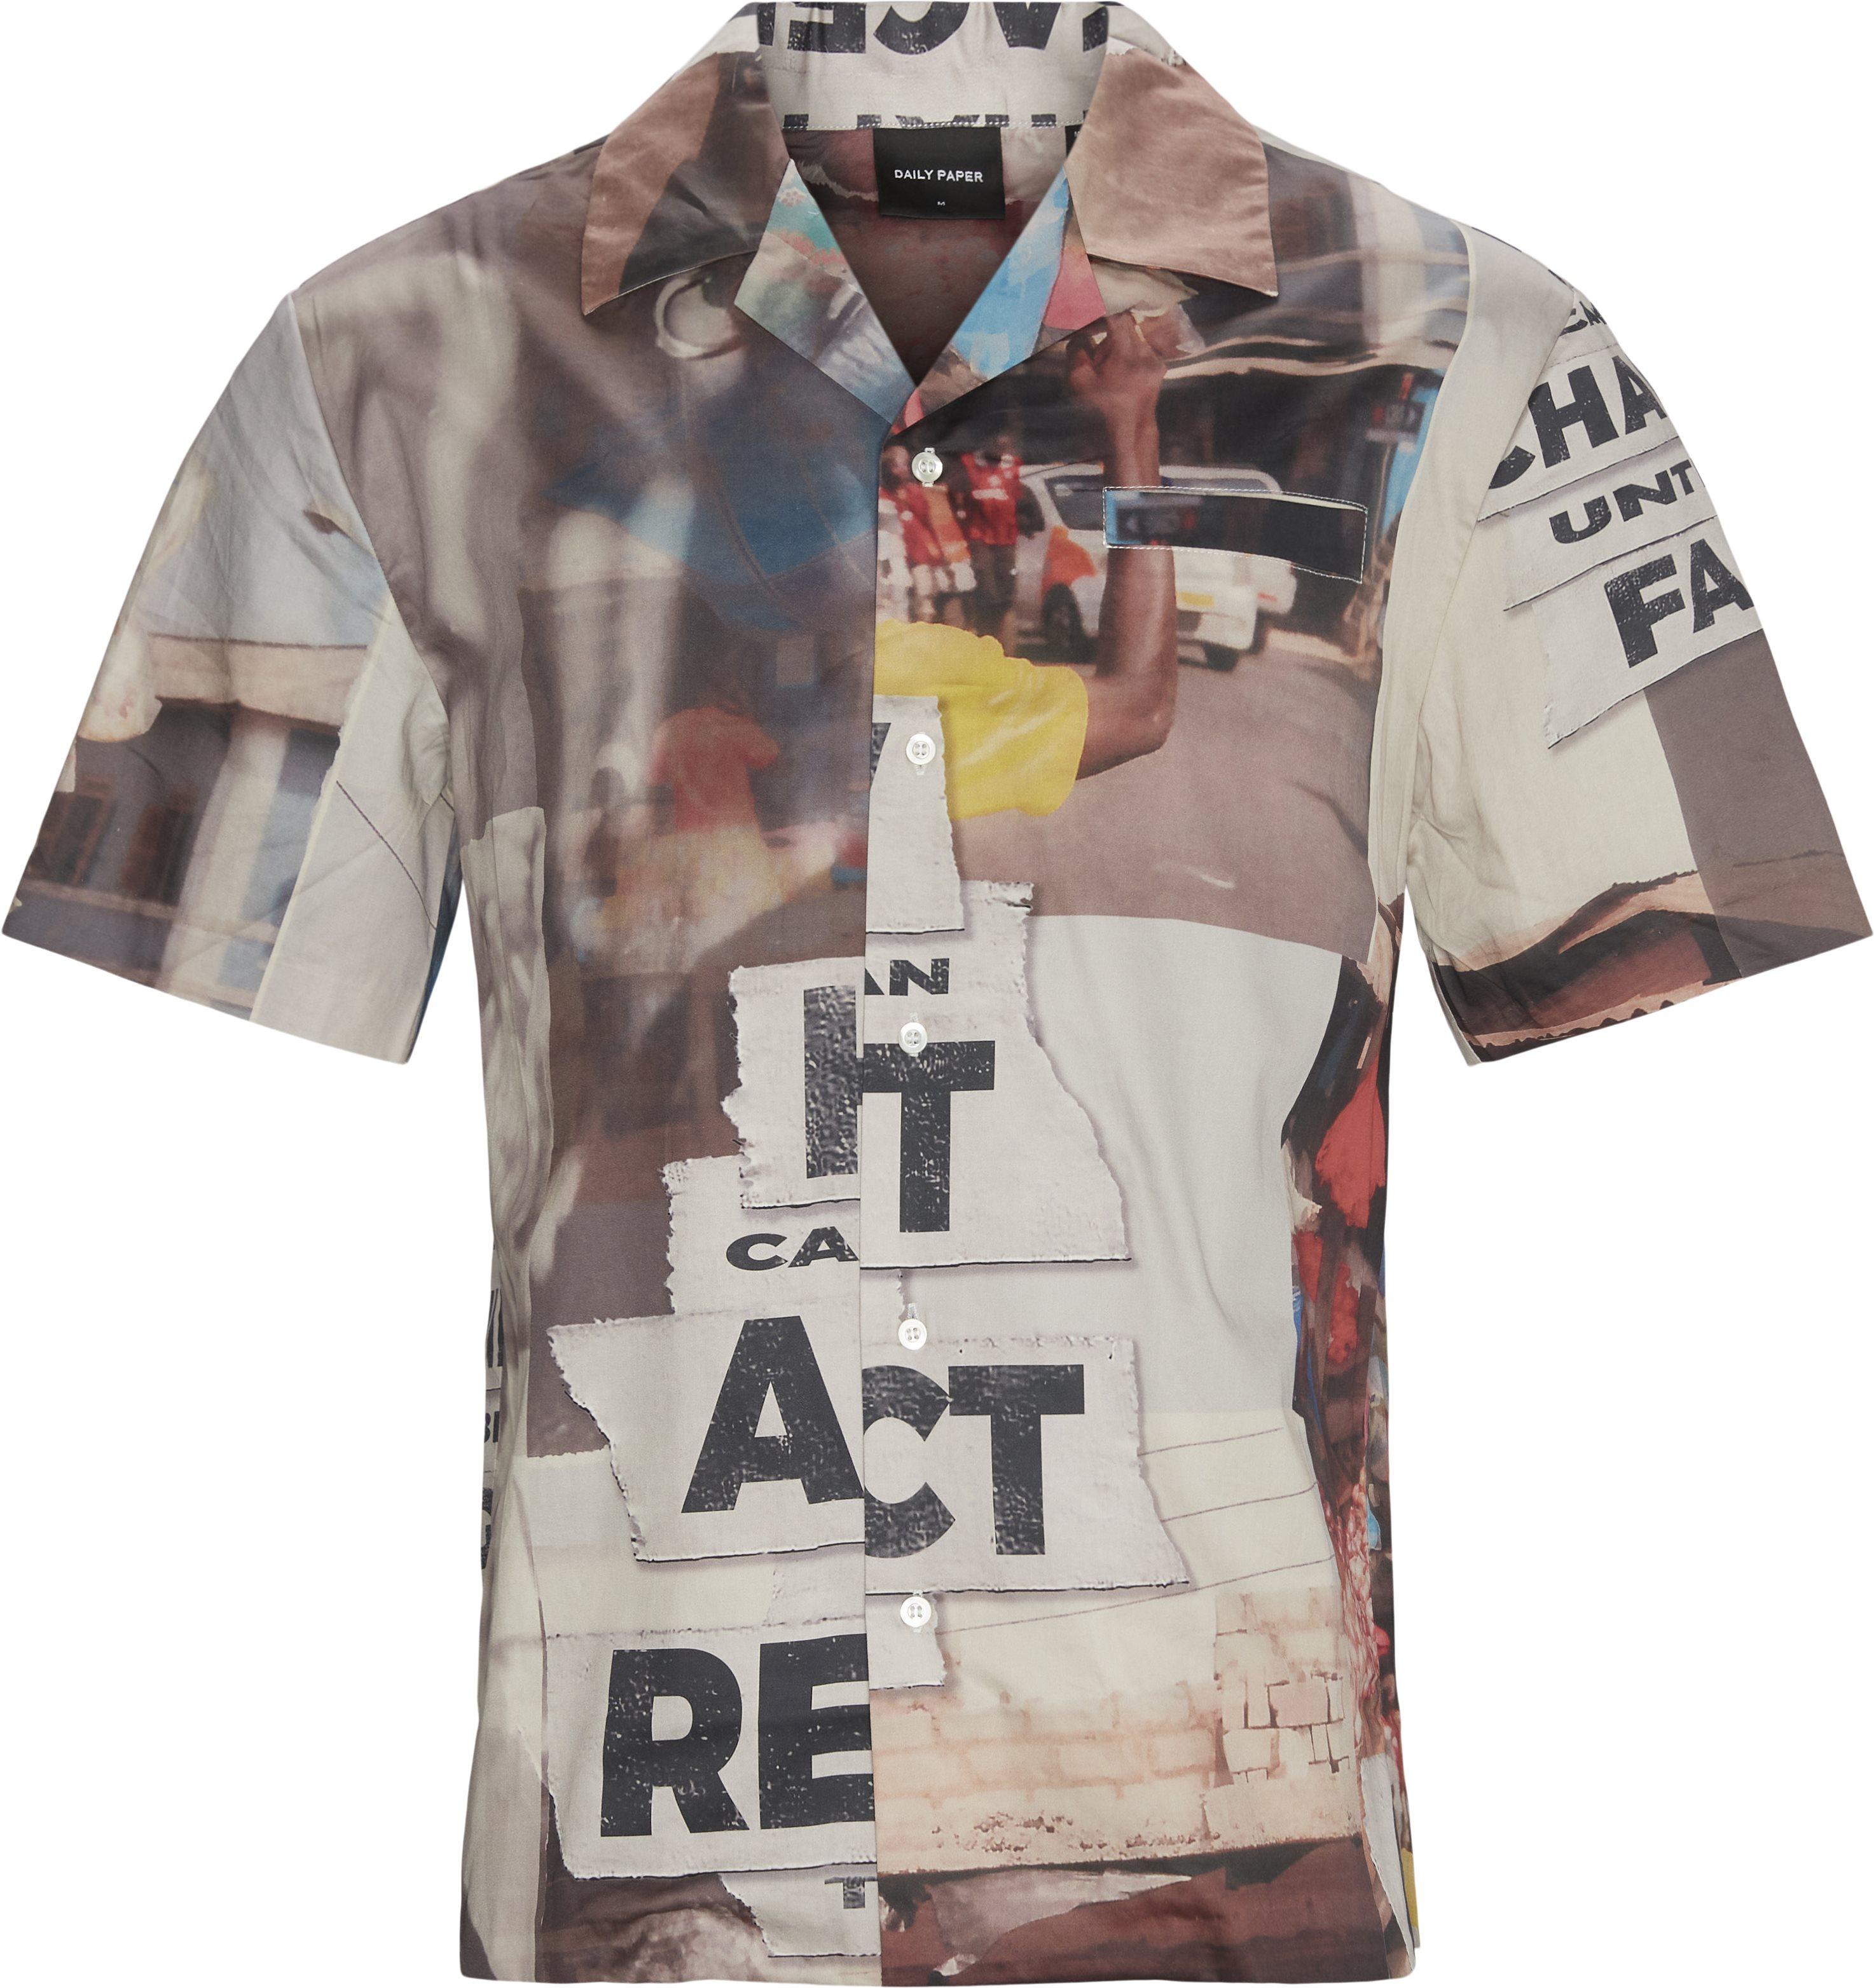 Kovan Collage Kortærmet Skjorte - Skjorter - Loose - Multi